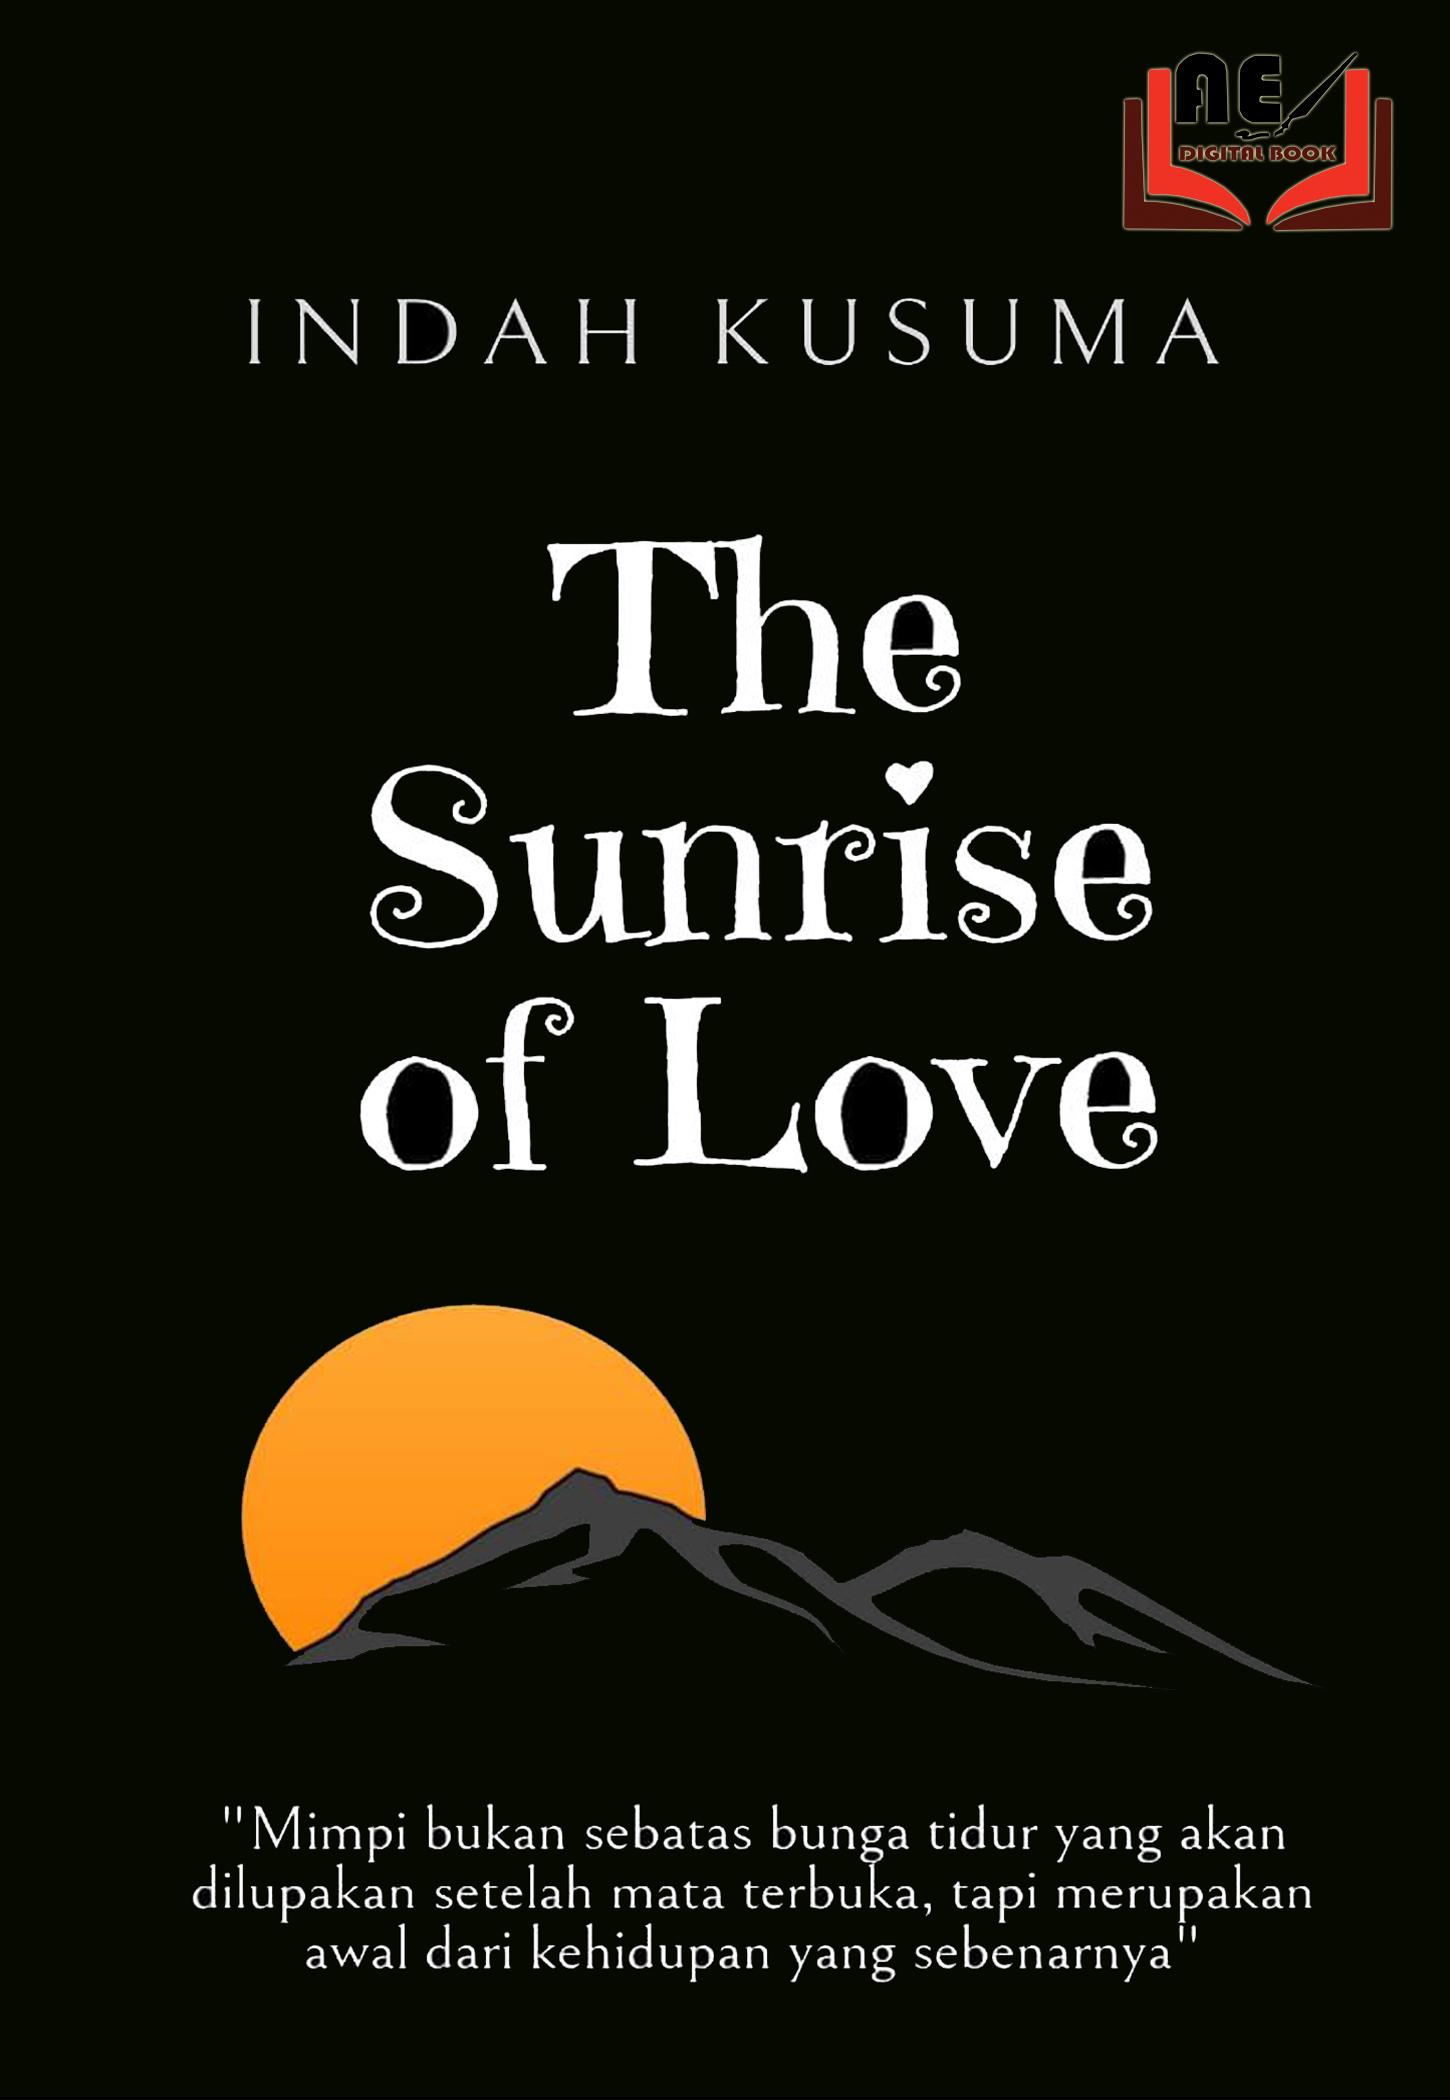 The Sunrise of Love